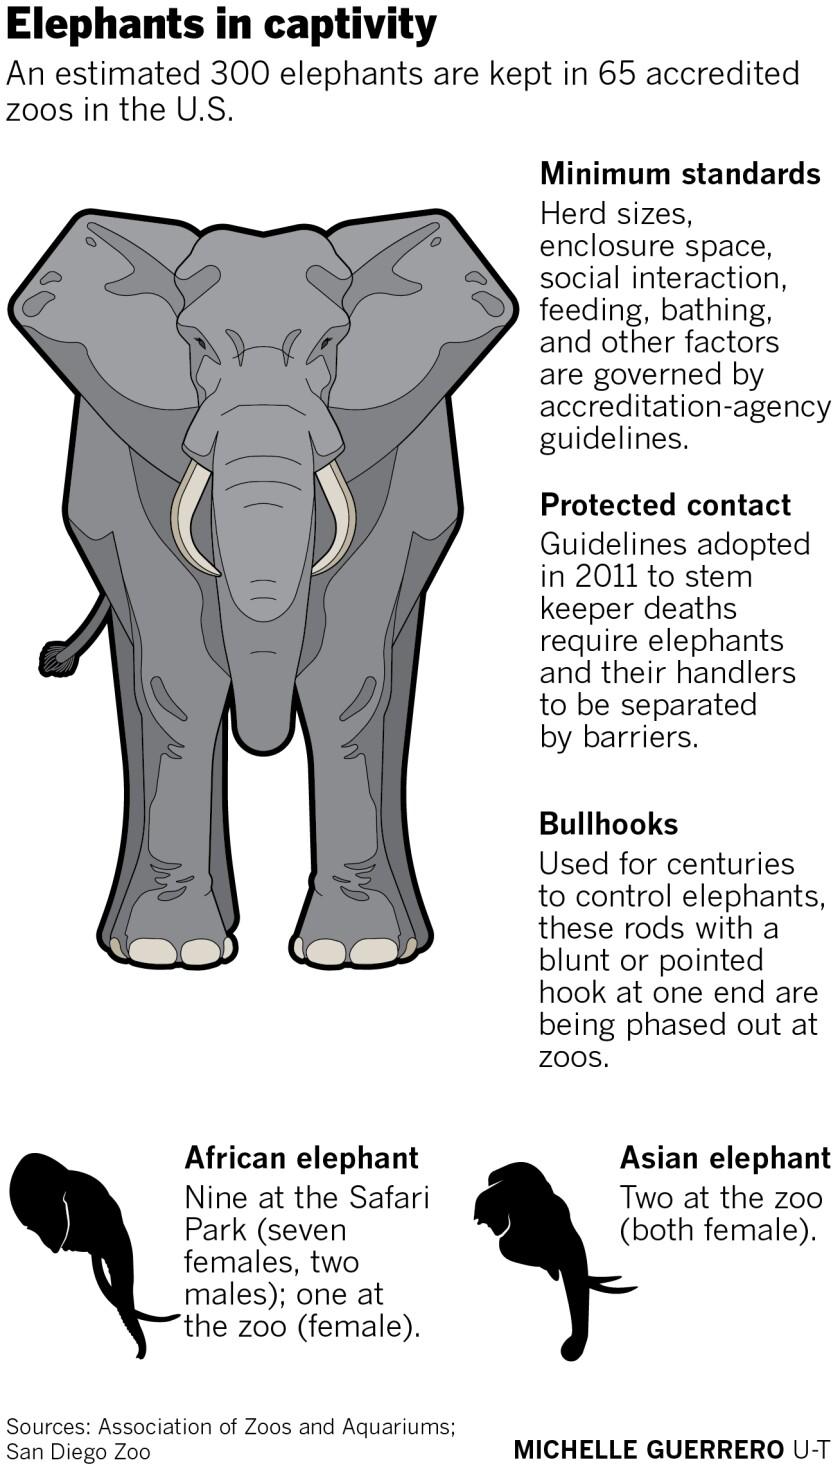 485886-w1-sd-me-elephants-in-captivity.jpg